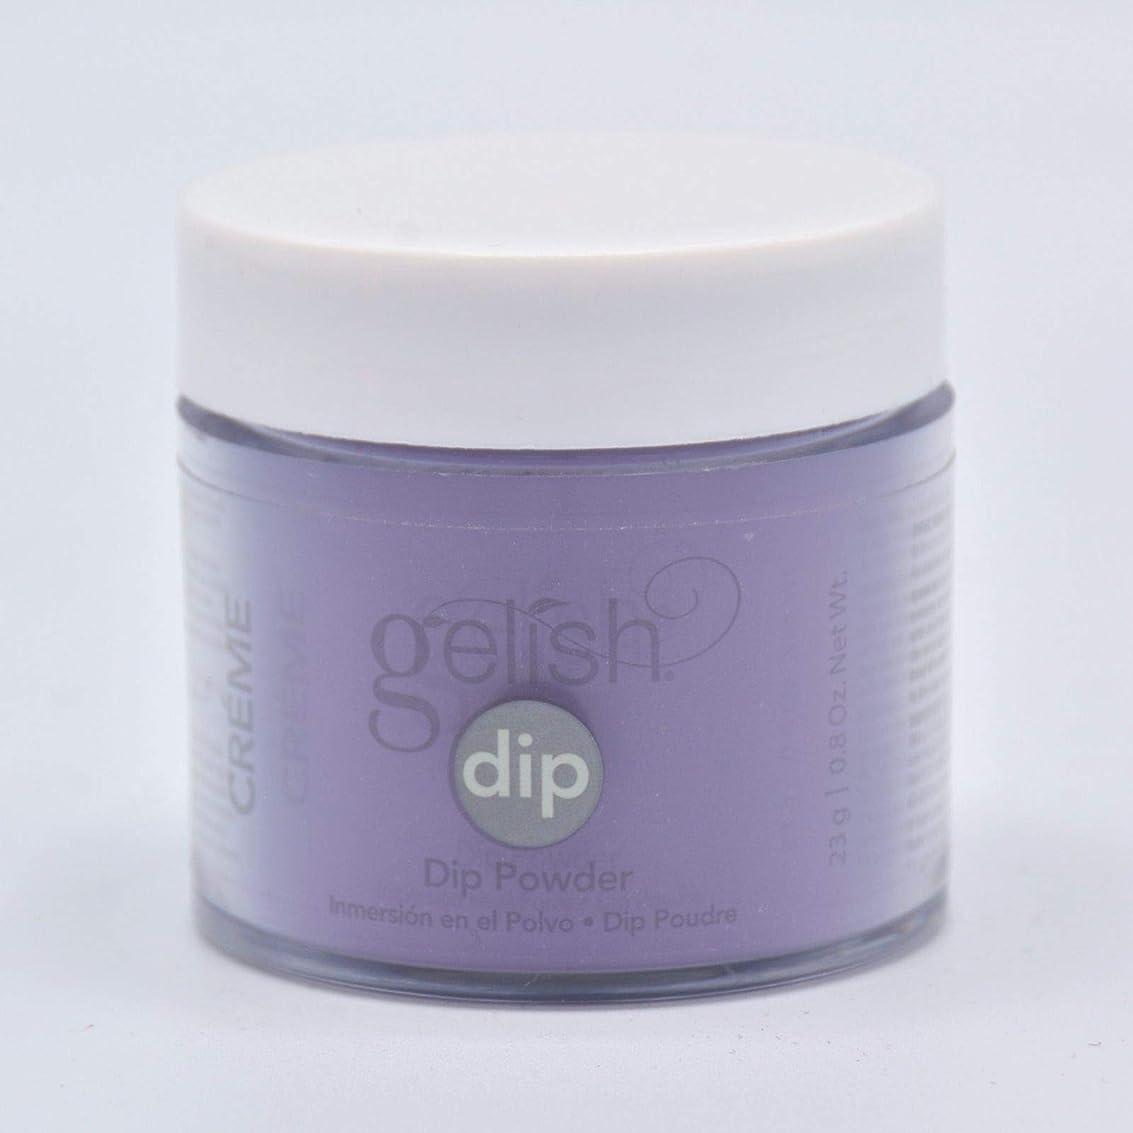 小数機会コピーHarmony Gelish - Acrylic Dip Powder - Black Cherry Berry - 23g / 0.8oz